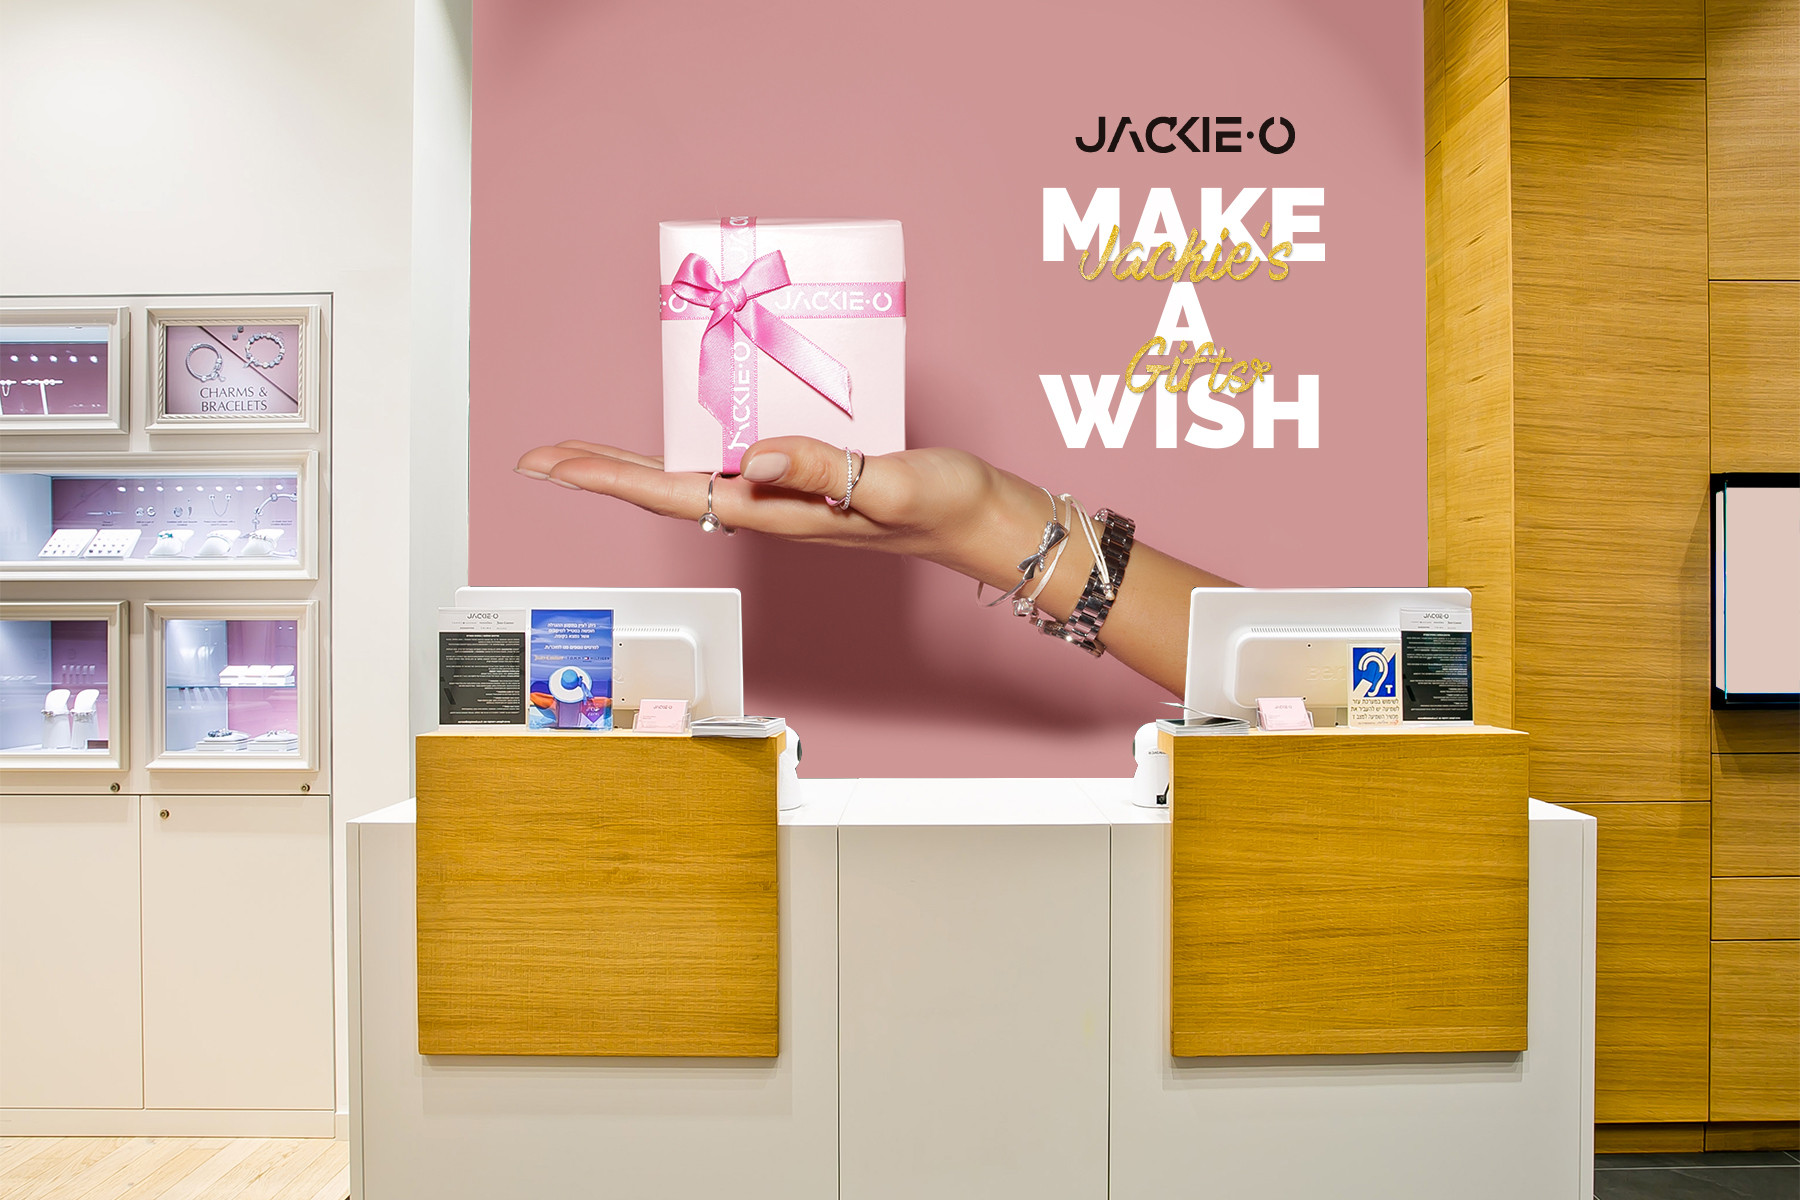 studio_bagaz'_jackie-o_4 3.jpg